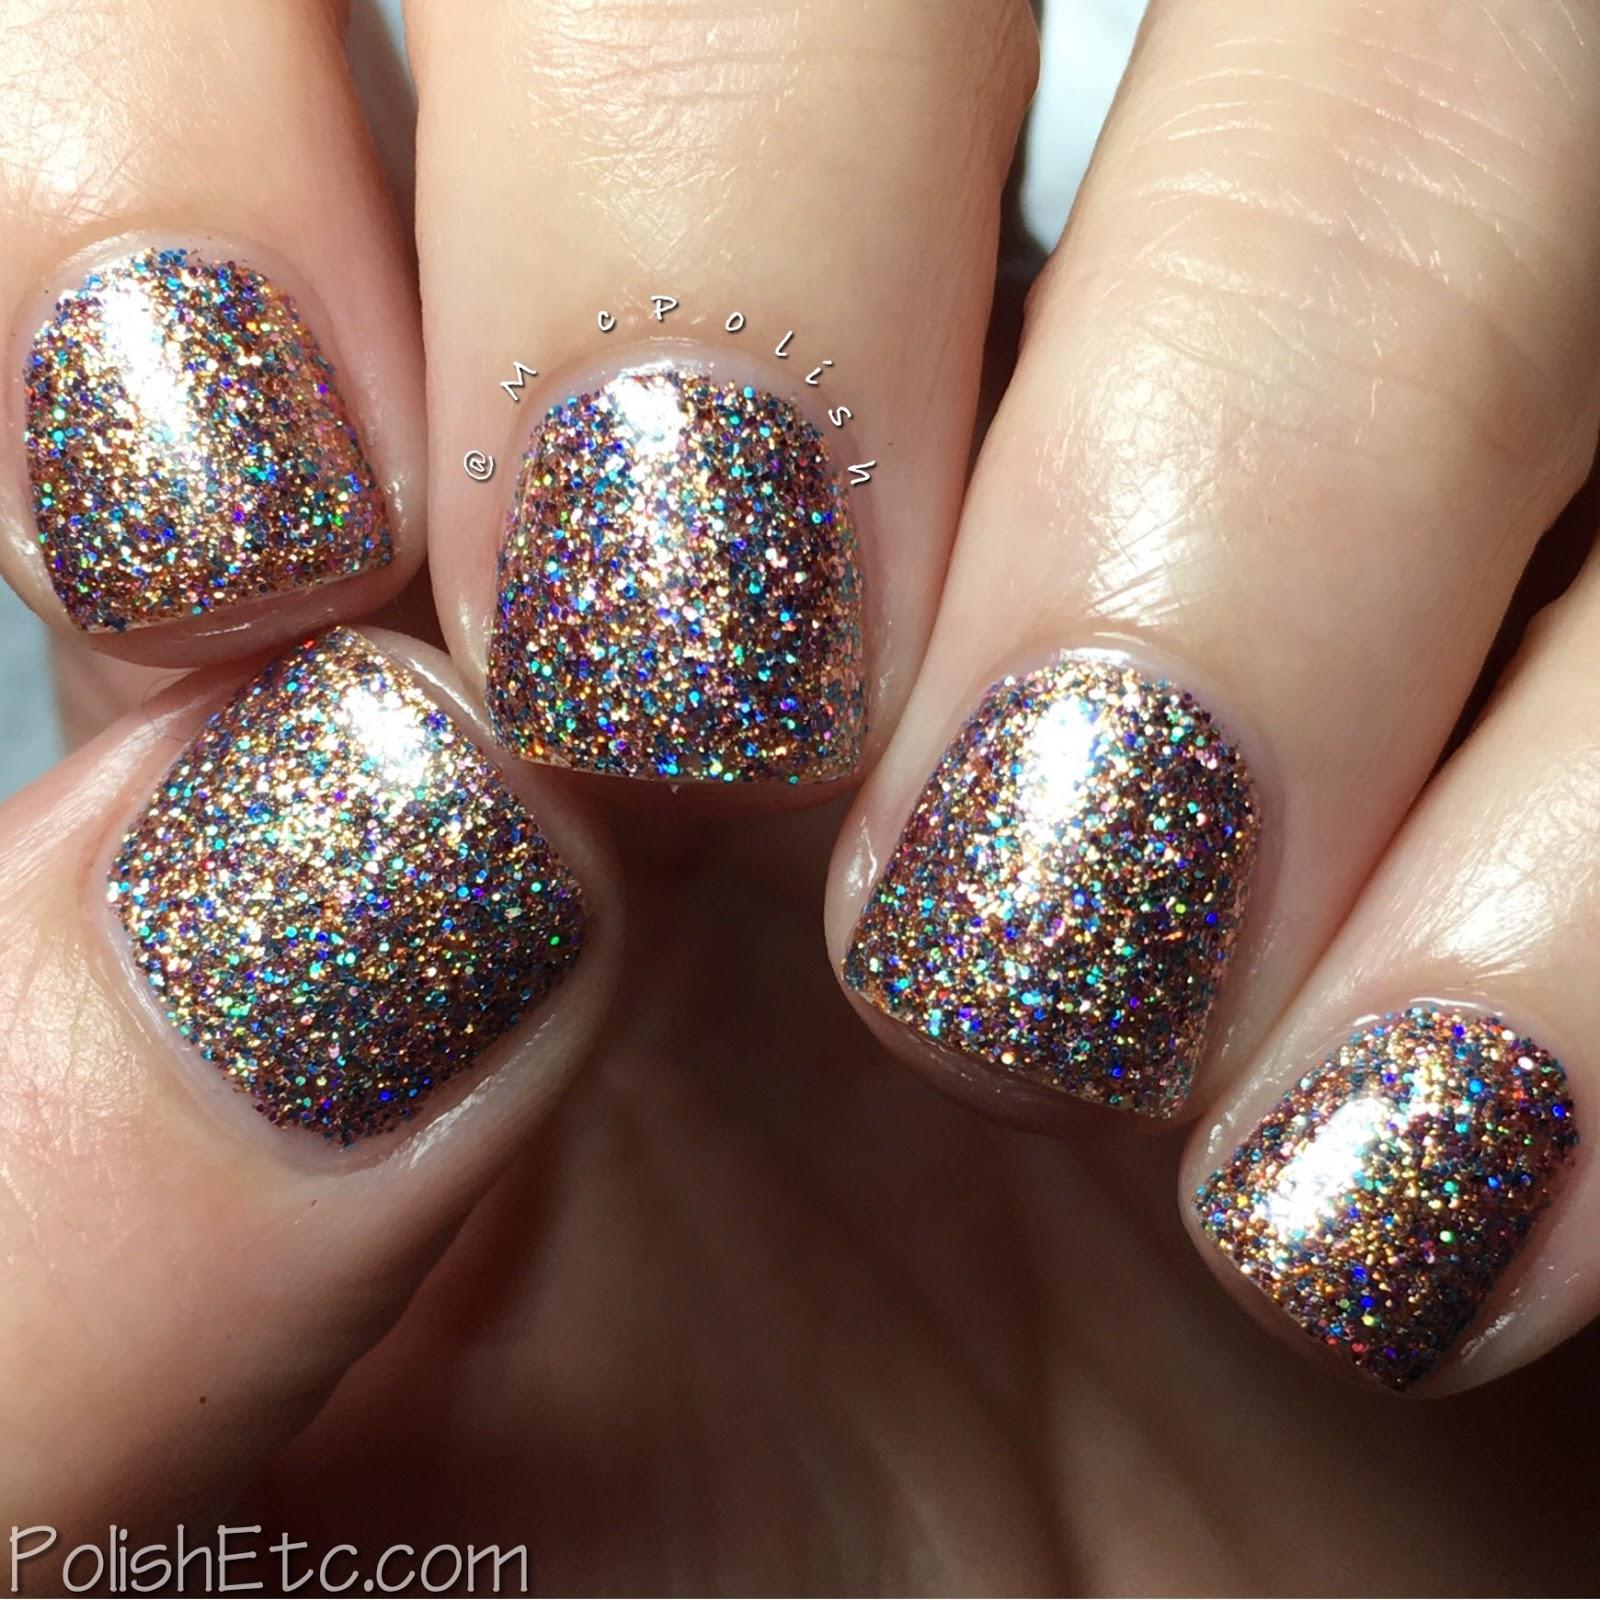 Indies Outside the Box: Fan-tastic Customs - McPolish - Glittertini by Top Shelf Lacquer